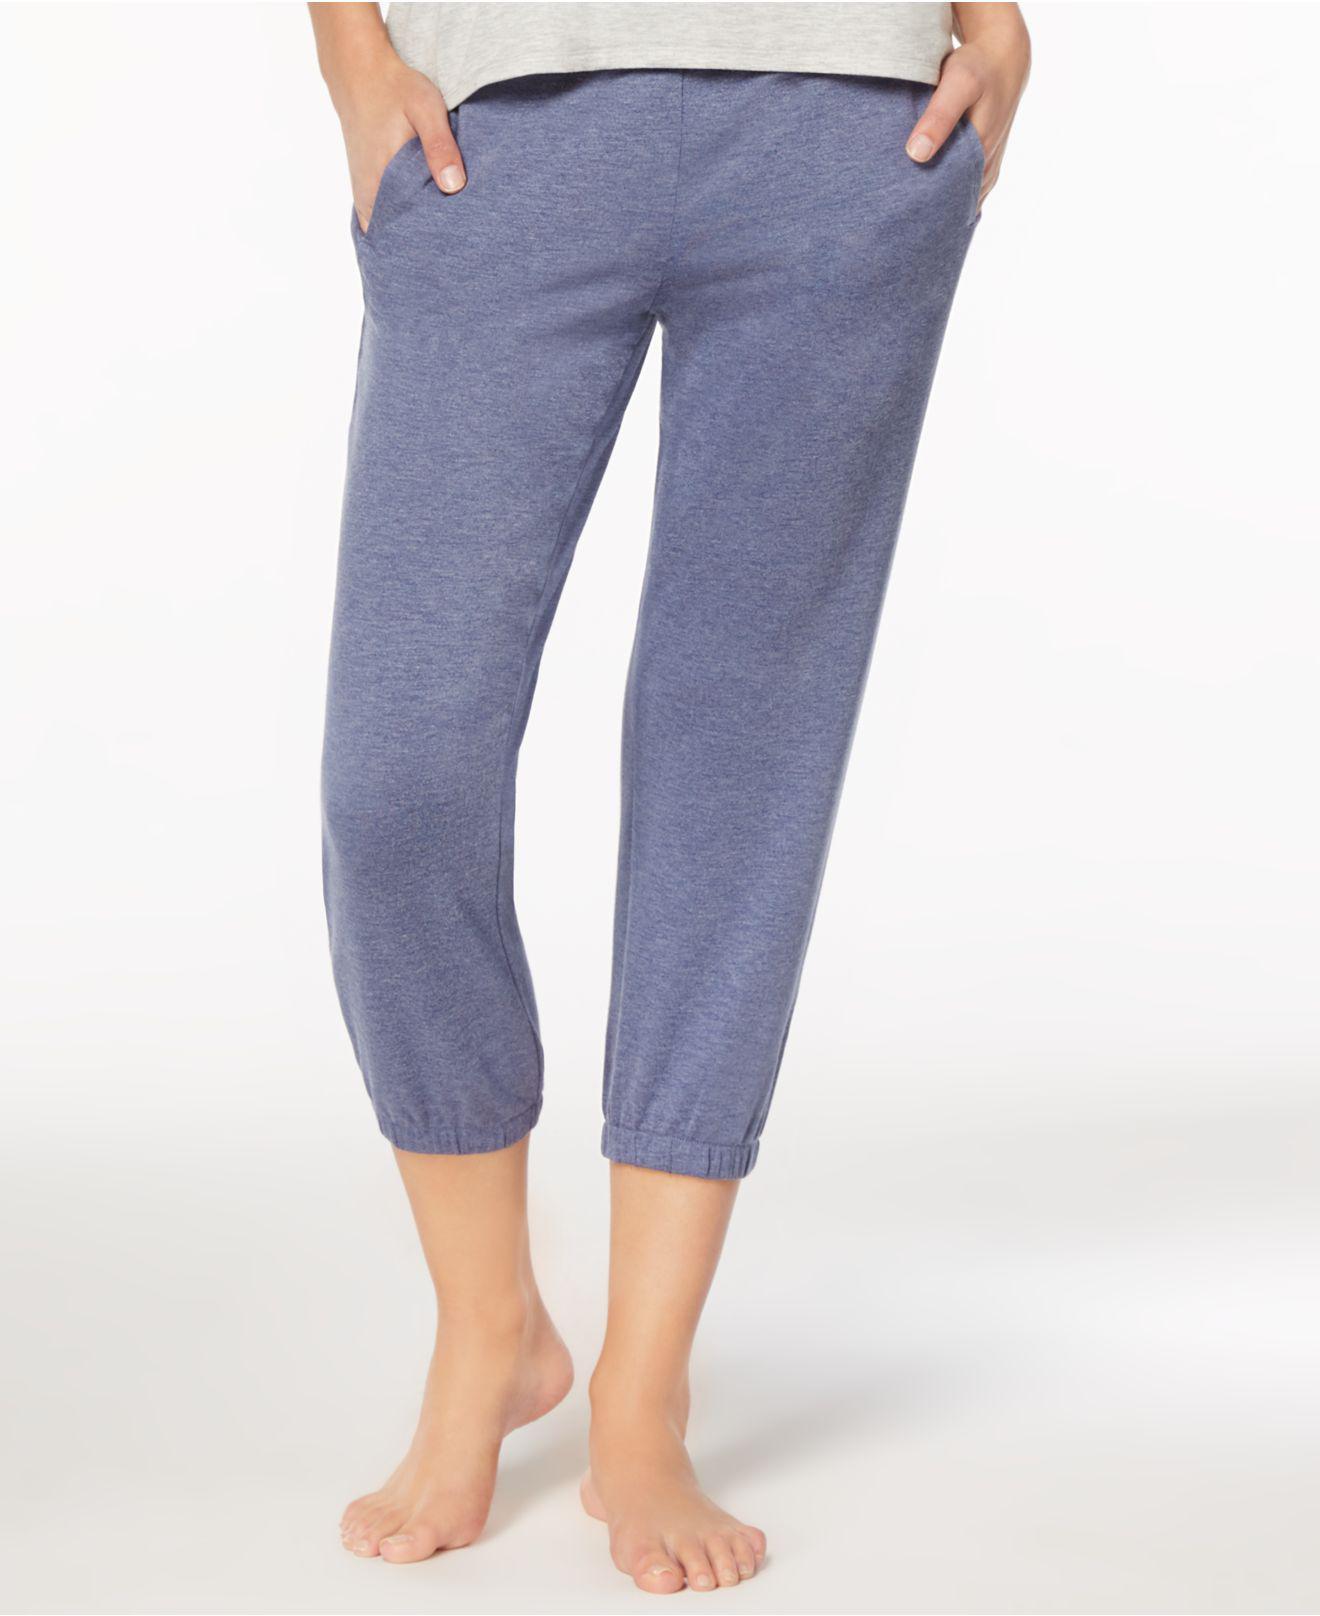 Mens Pajamas With Elastic Cuffs - searscom